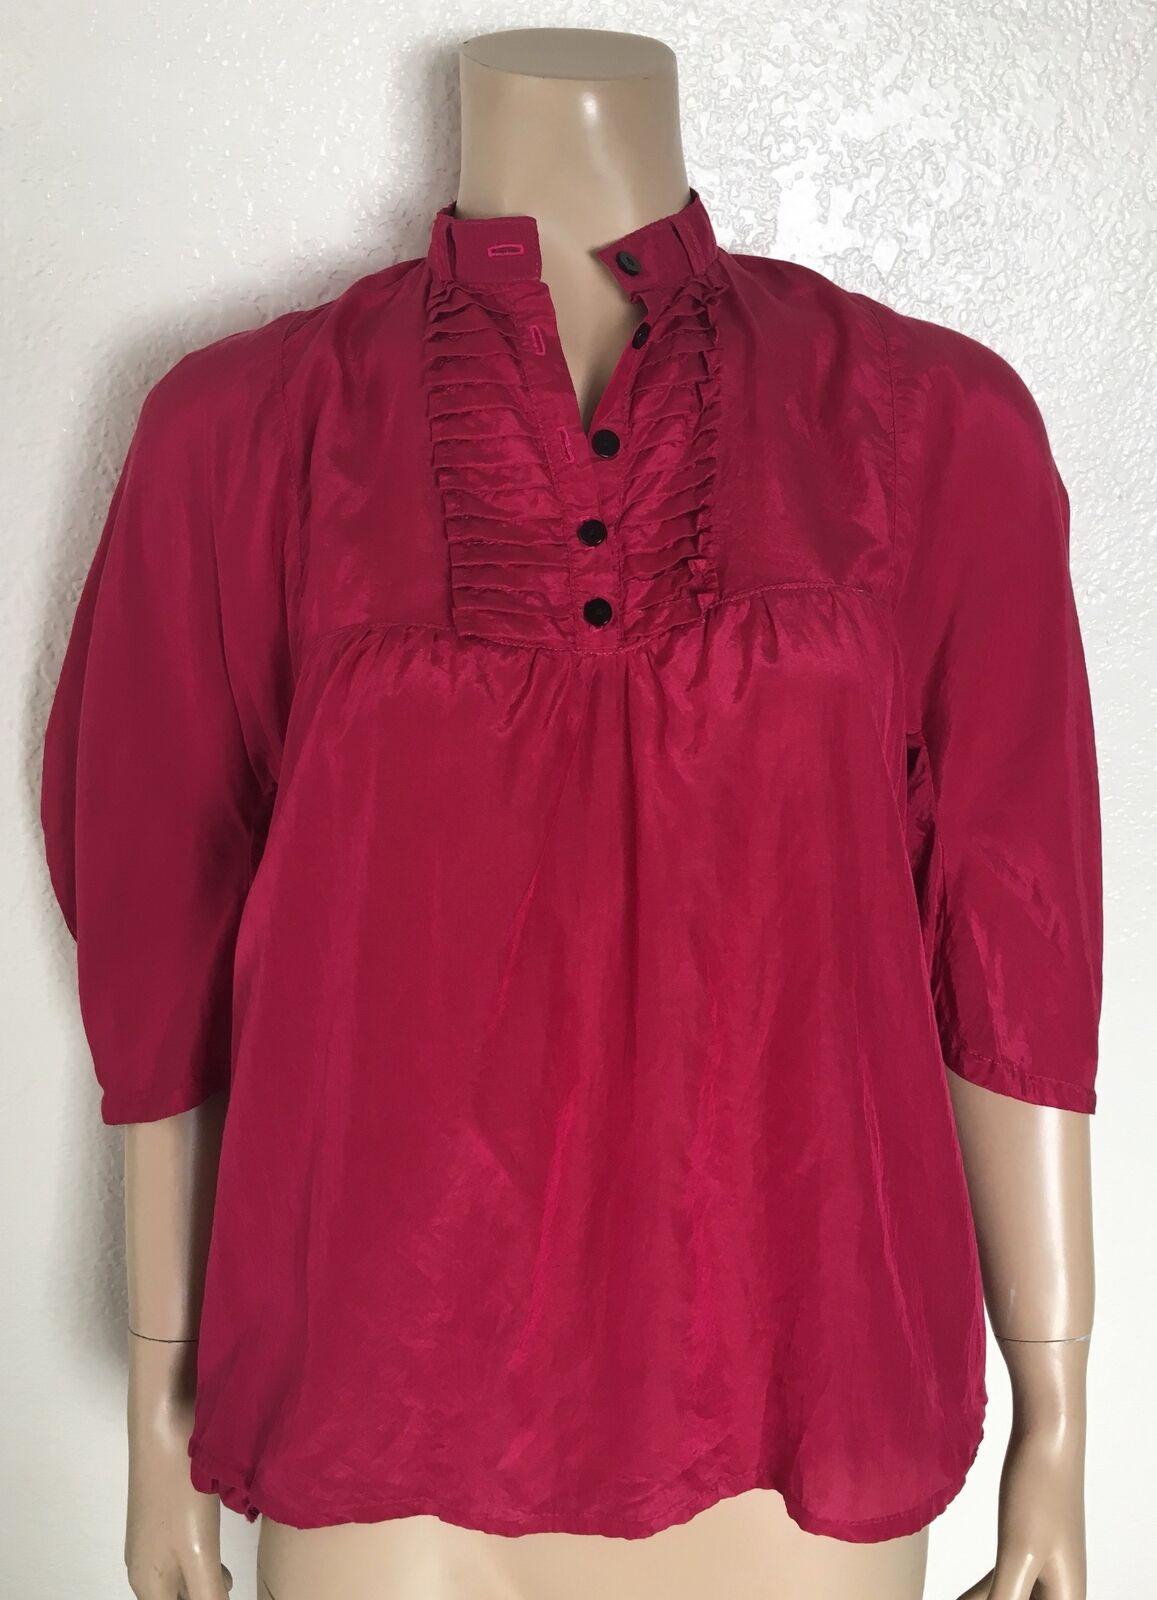 JUDI pinkN New York Designer Bright Pink Peasant Blouse Top, Size Small S